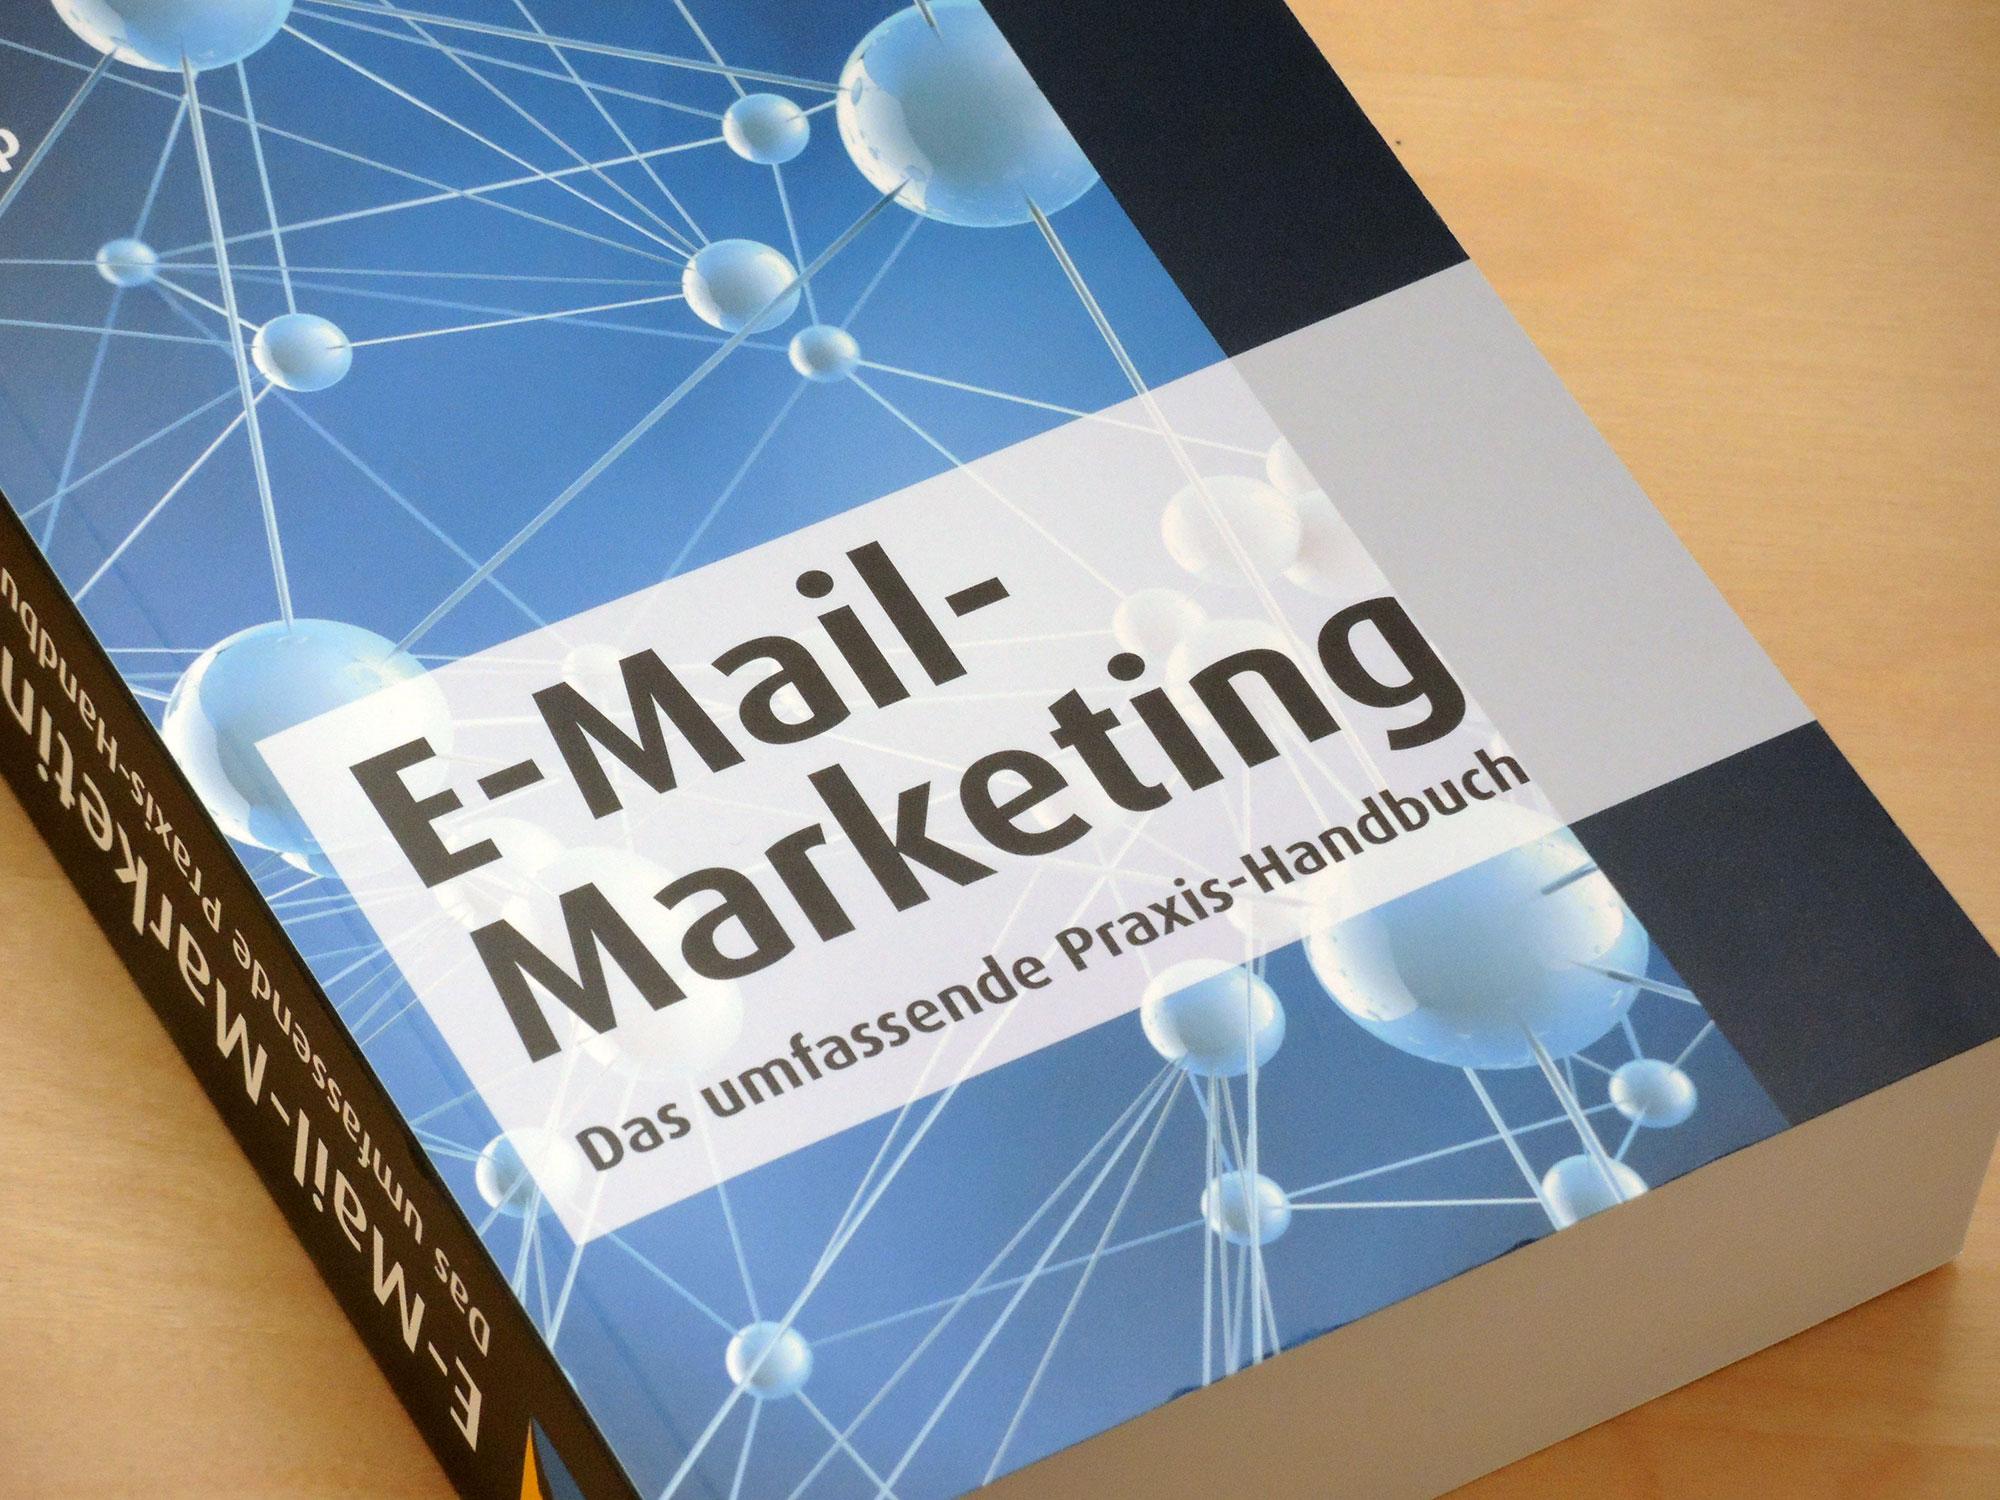 E-Mail-Marketing - Das umfassende Praxis-Handbuch